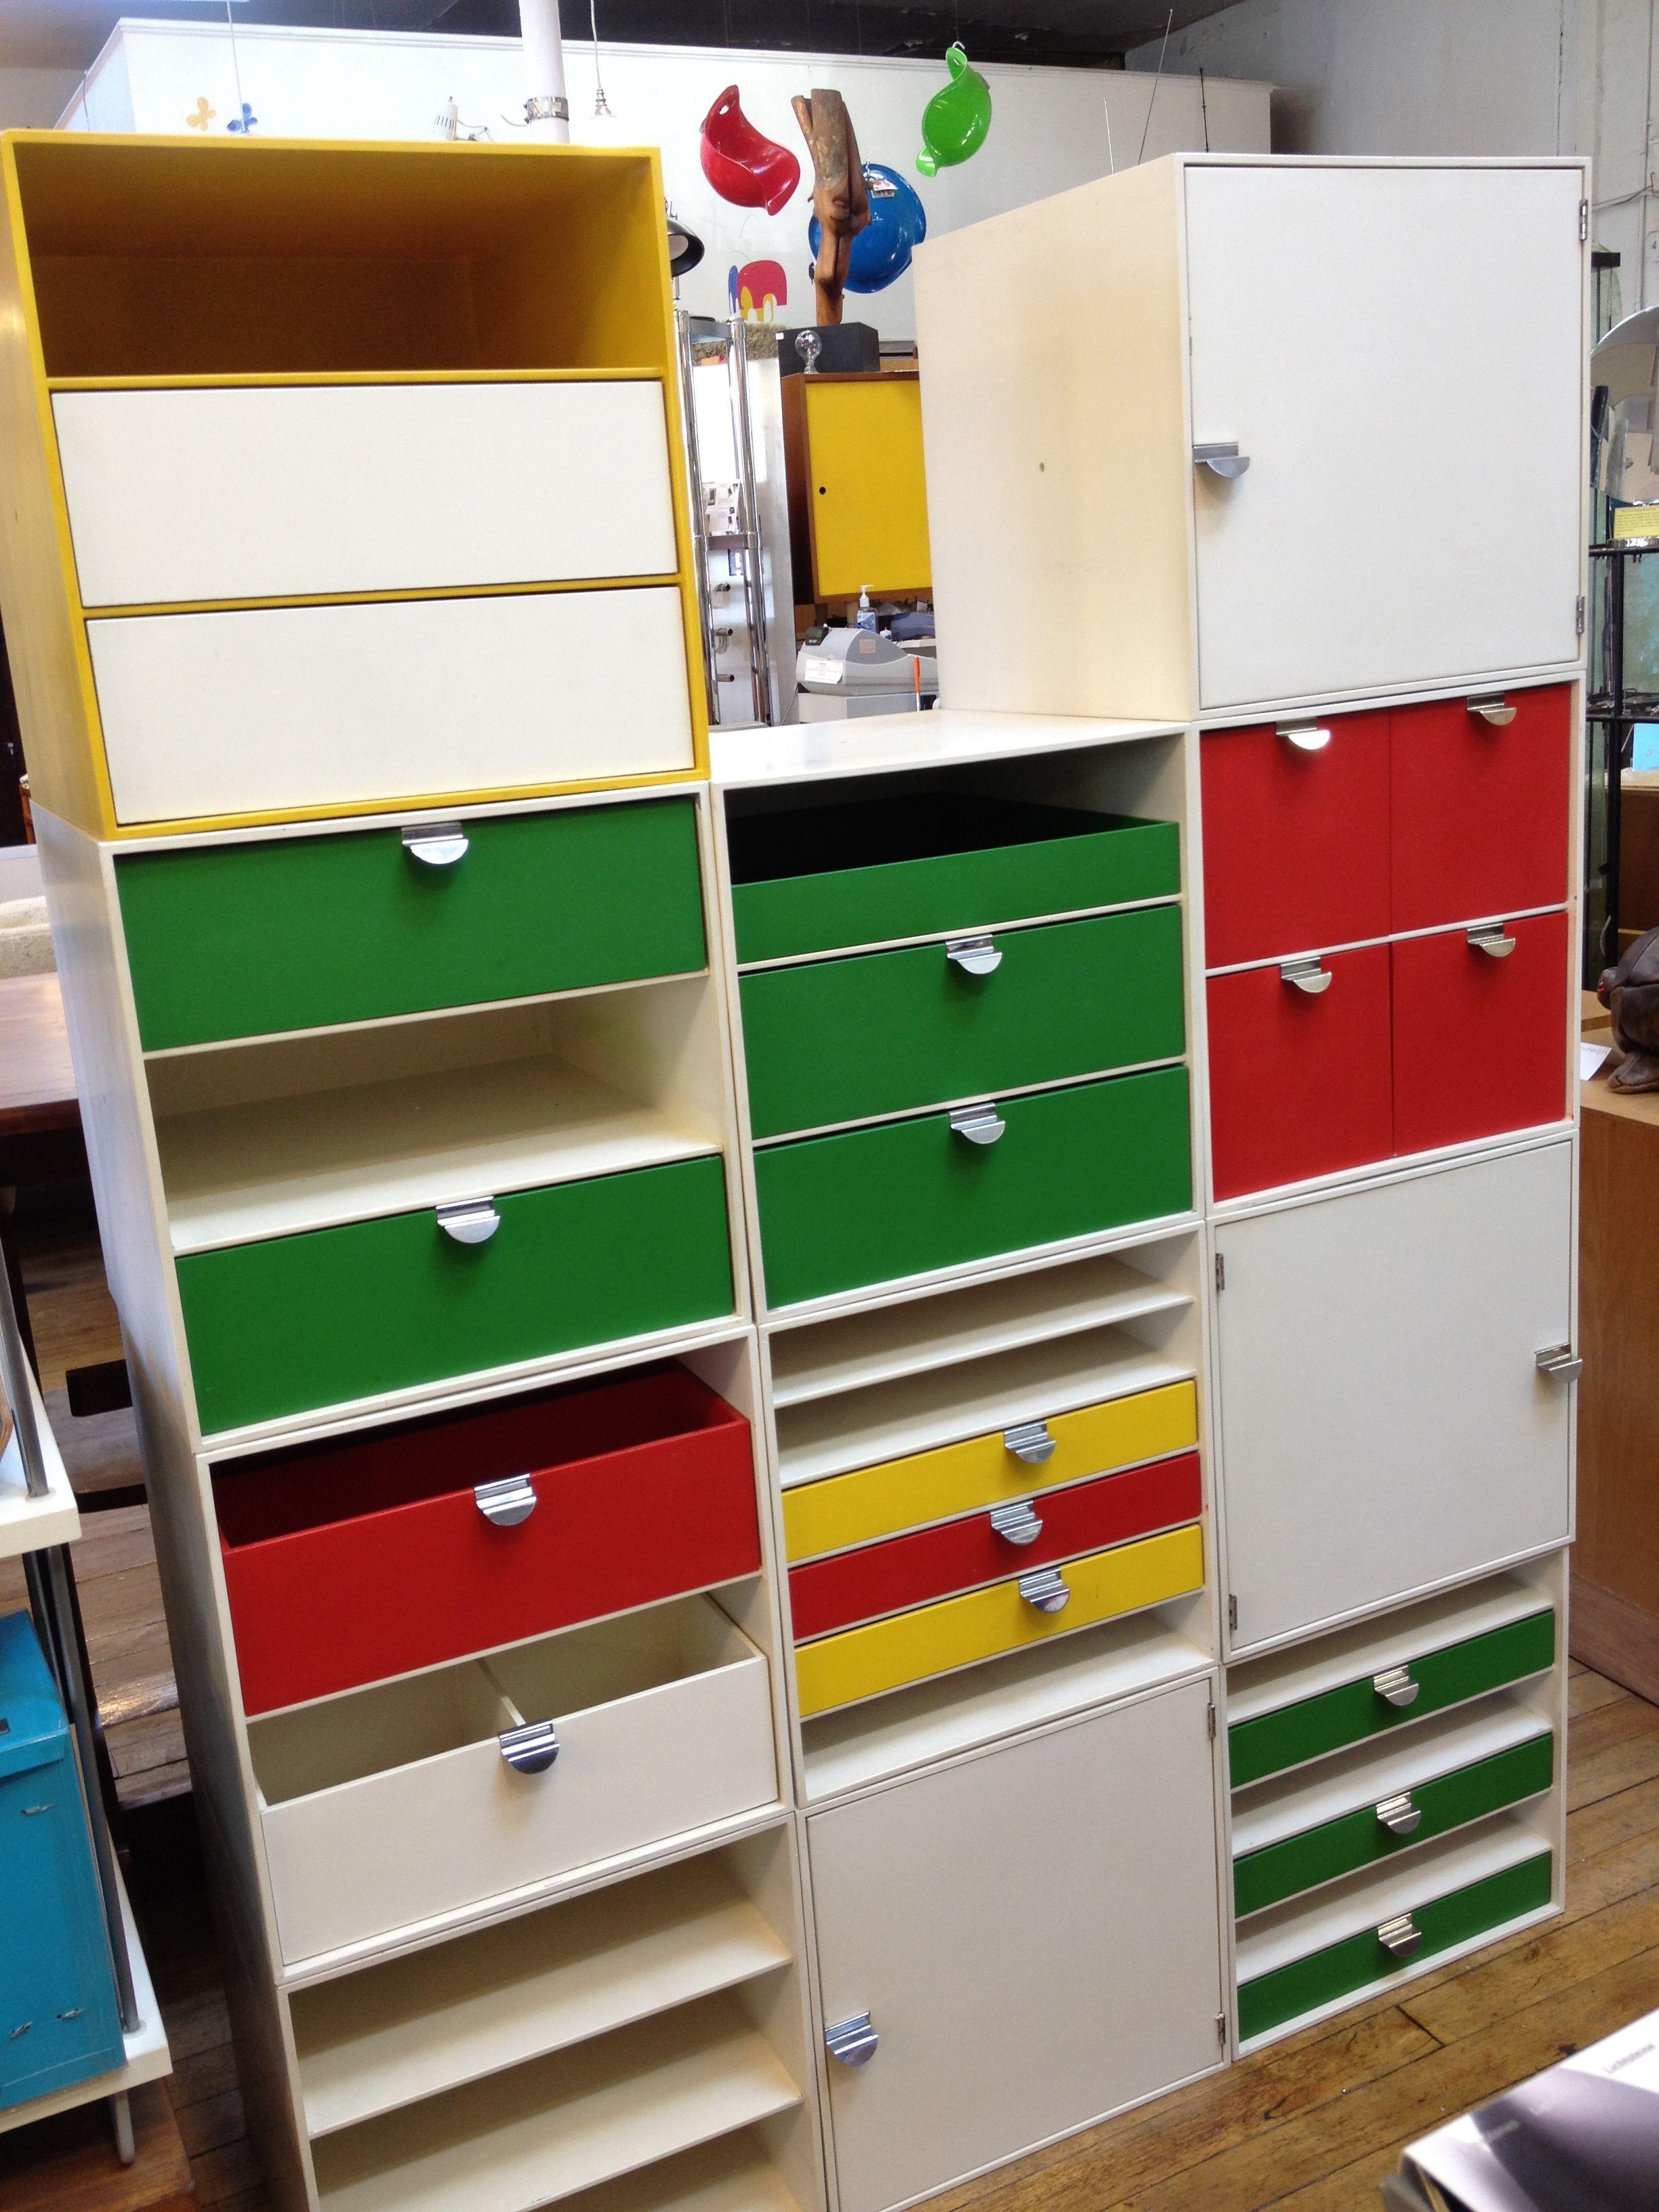 My Little Pony Metal Toy Storage Unit Box Organiser Kids: Vintage Palaset Cube Storage At Abodeon. Organize